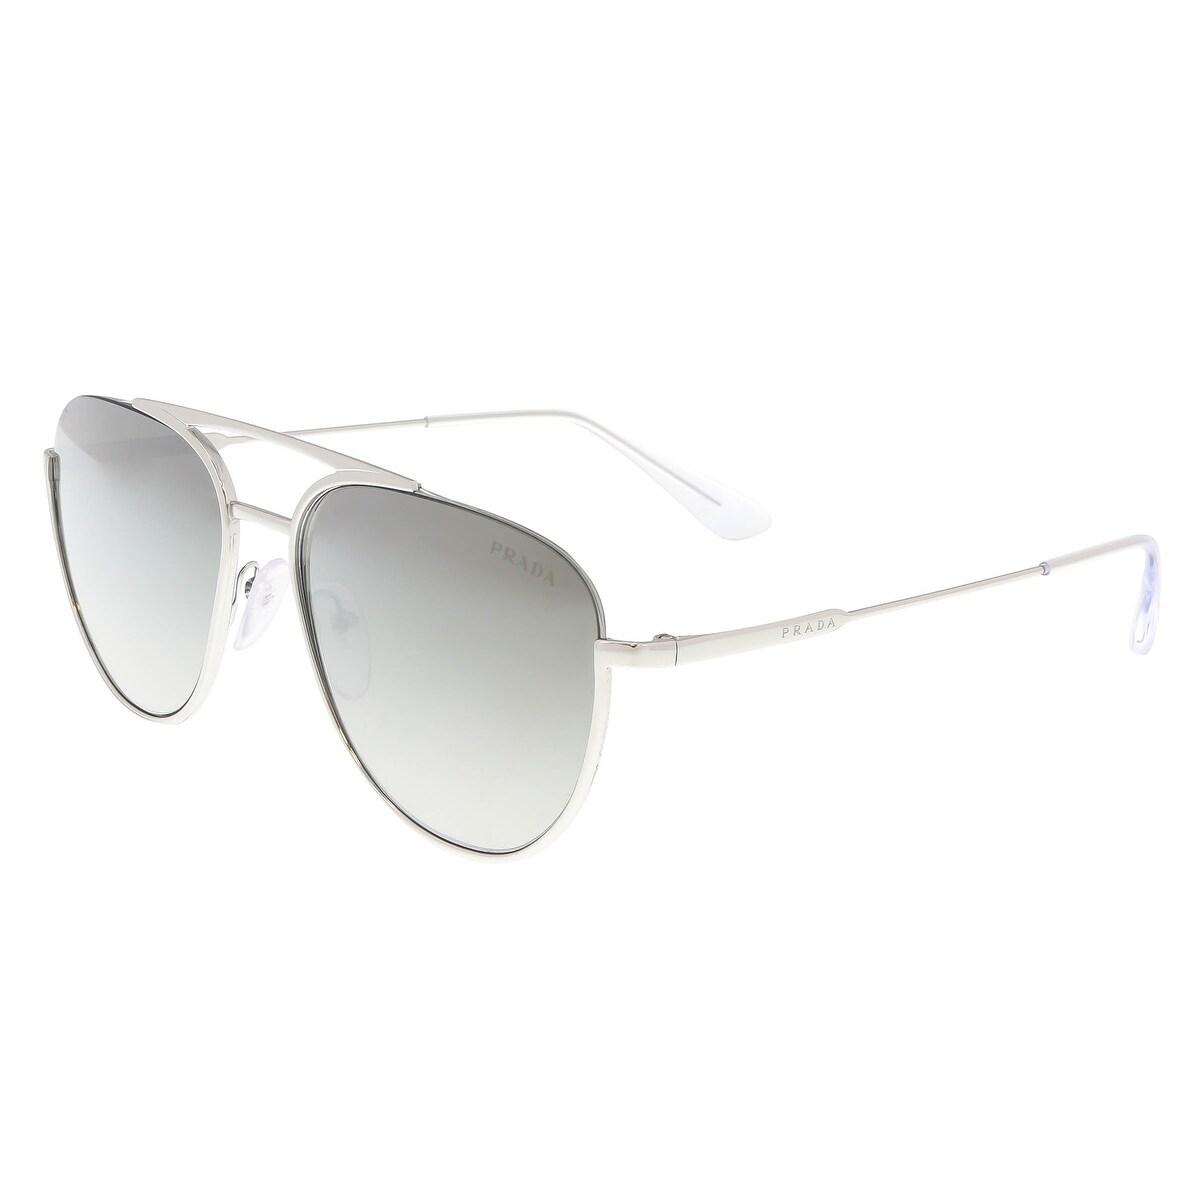 b971b3b8f7af Prada Men's Sunglasses | Find Great Sunglasses Deals Shopping at Overstock